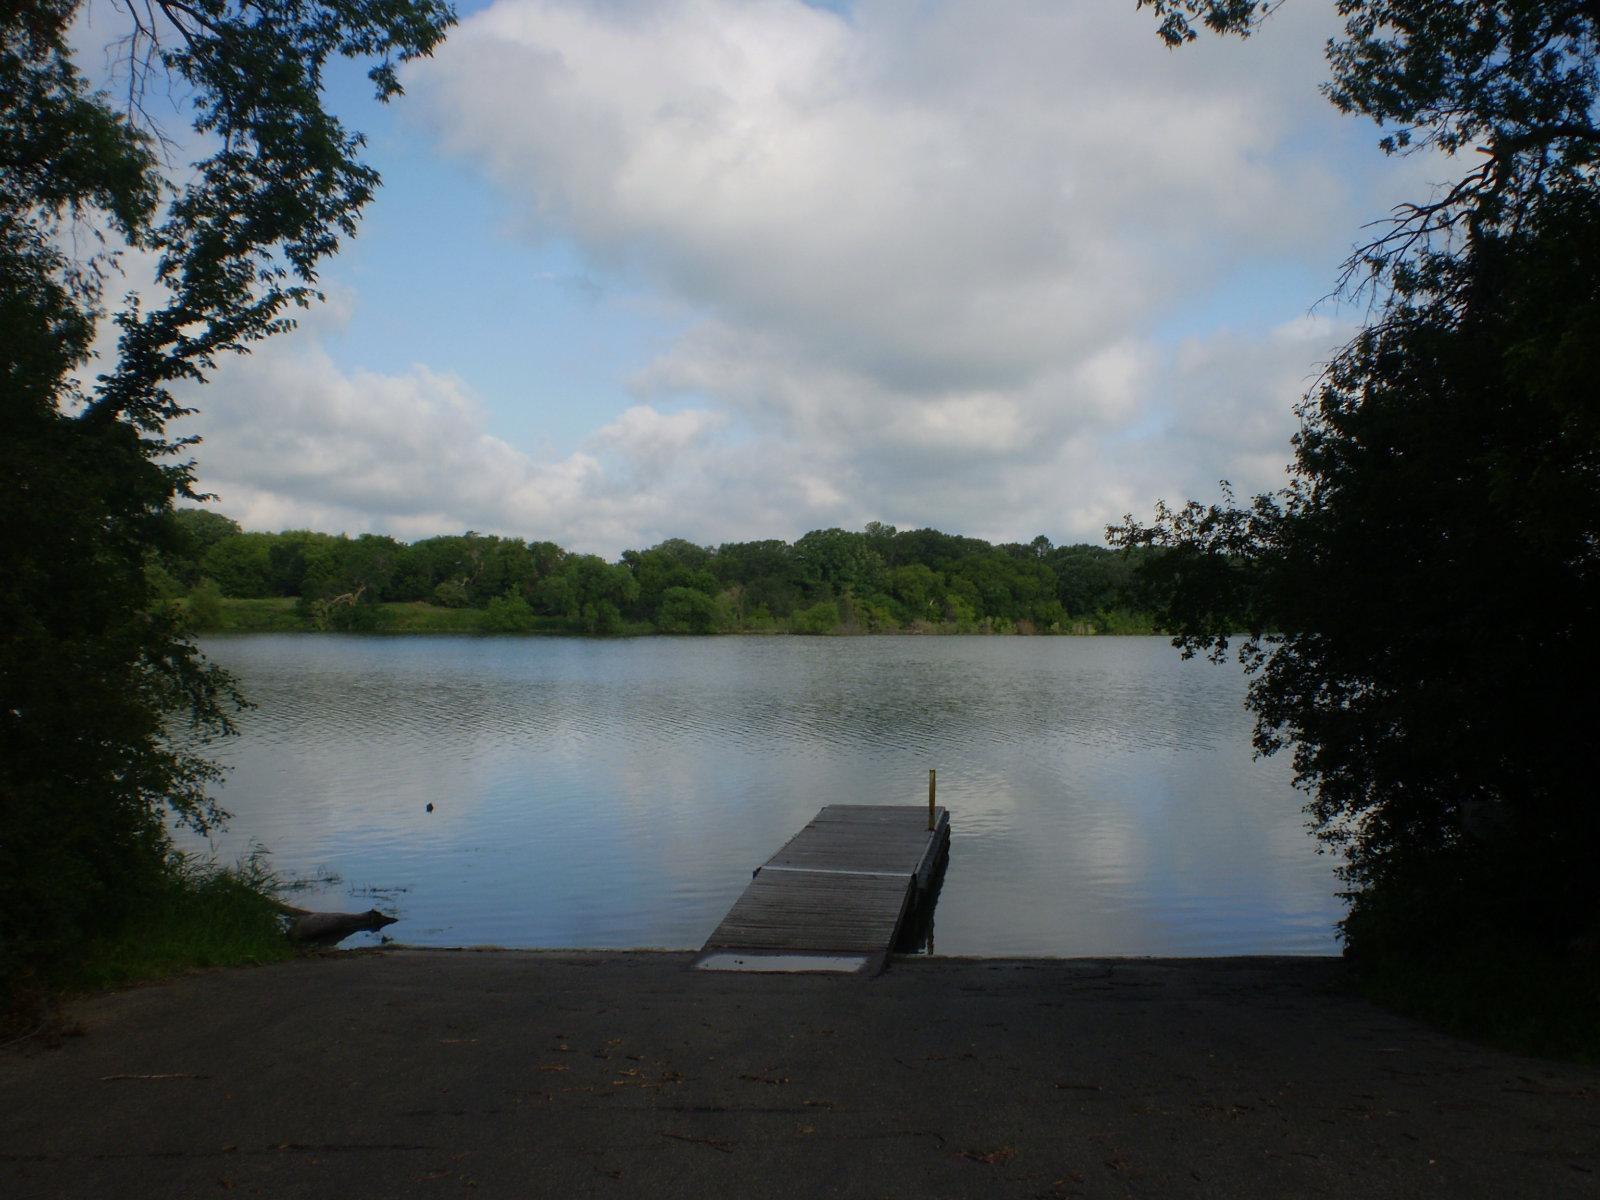 Oakwood lakes state park a south dakota park located near for The oakwood